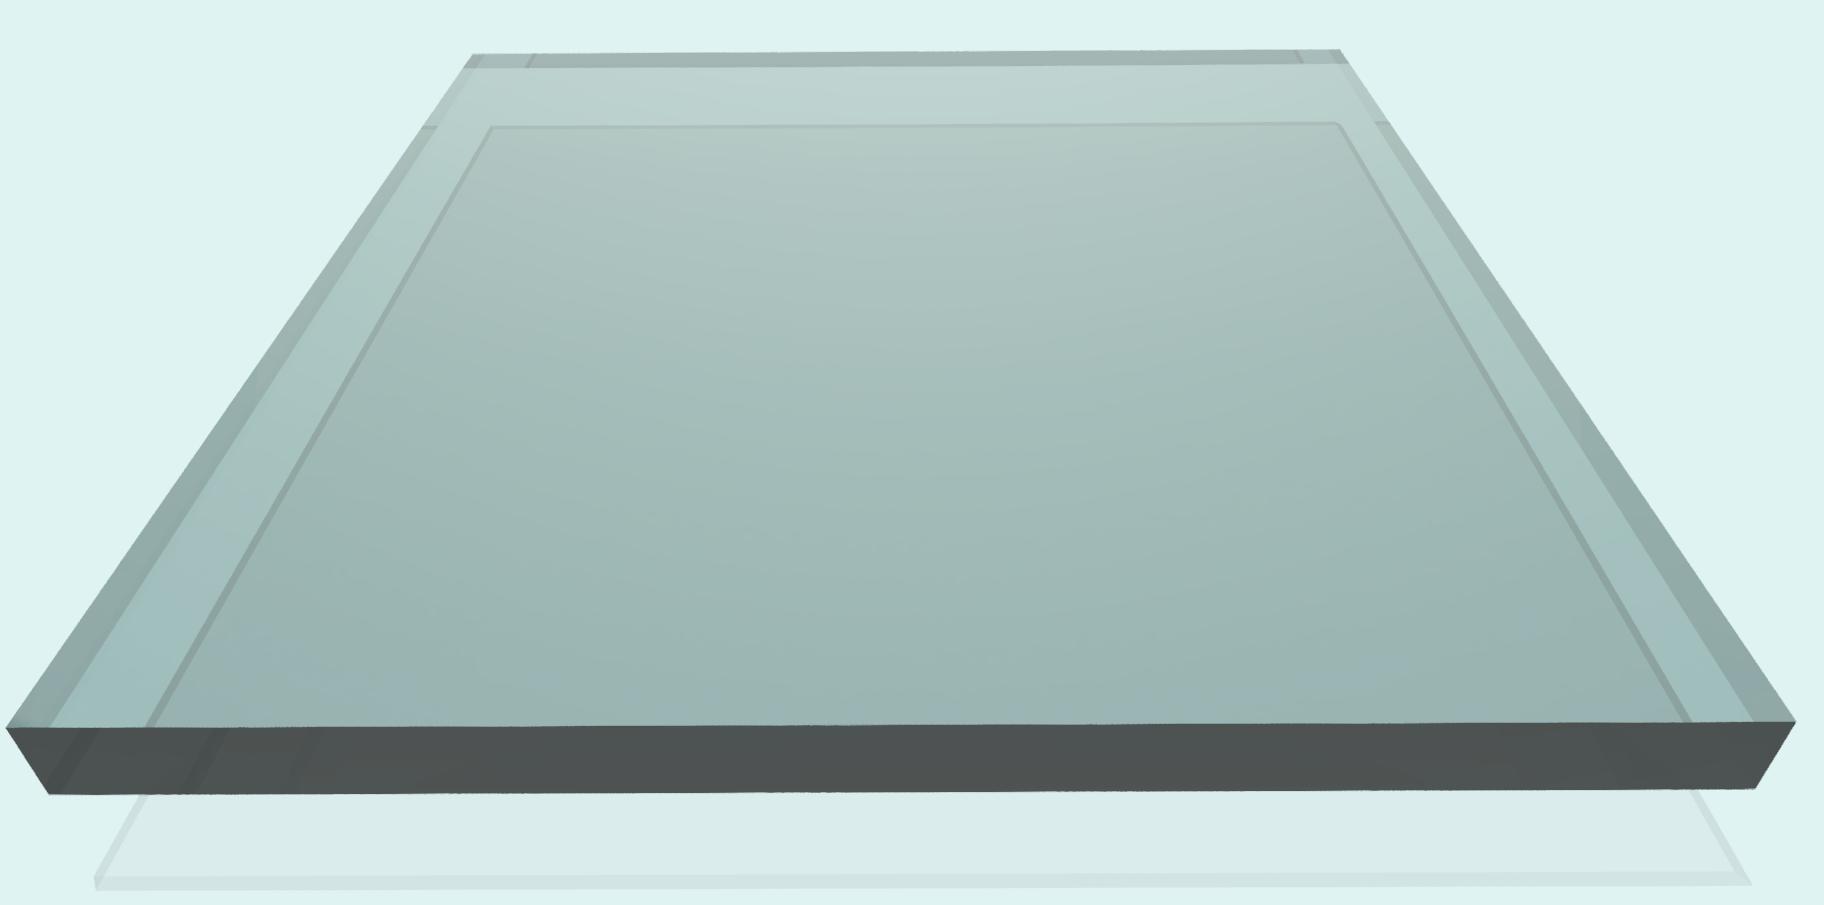 Polycarbonat 12 mm, klar